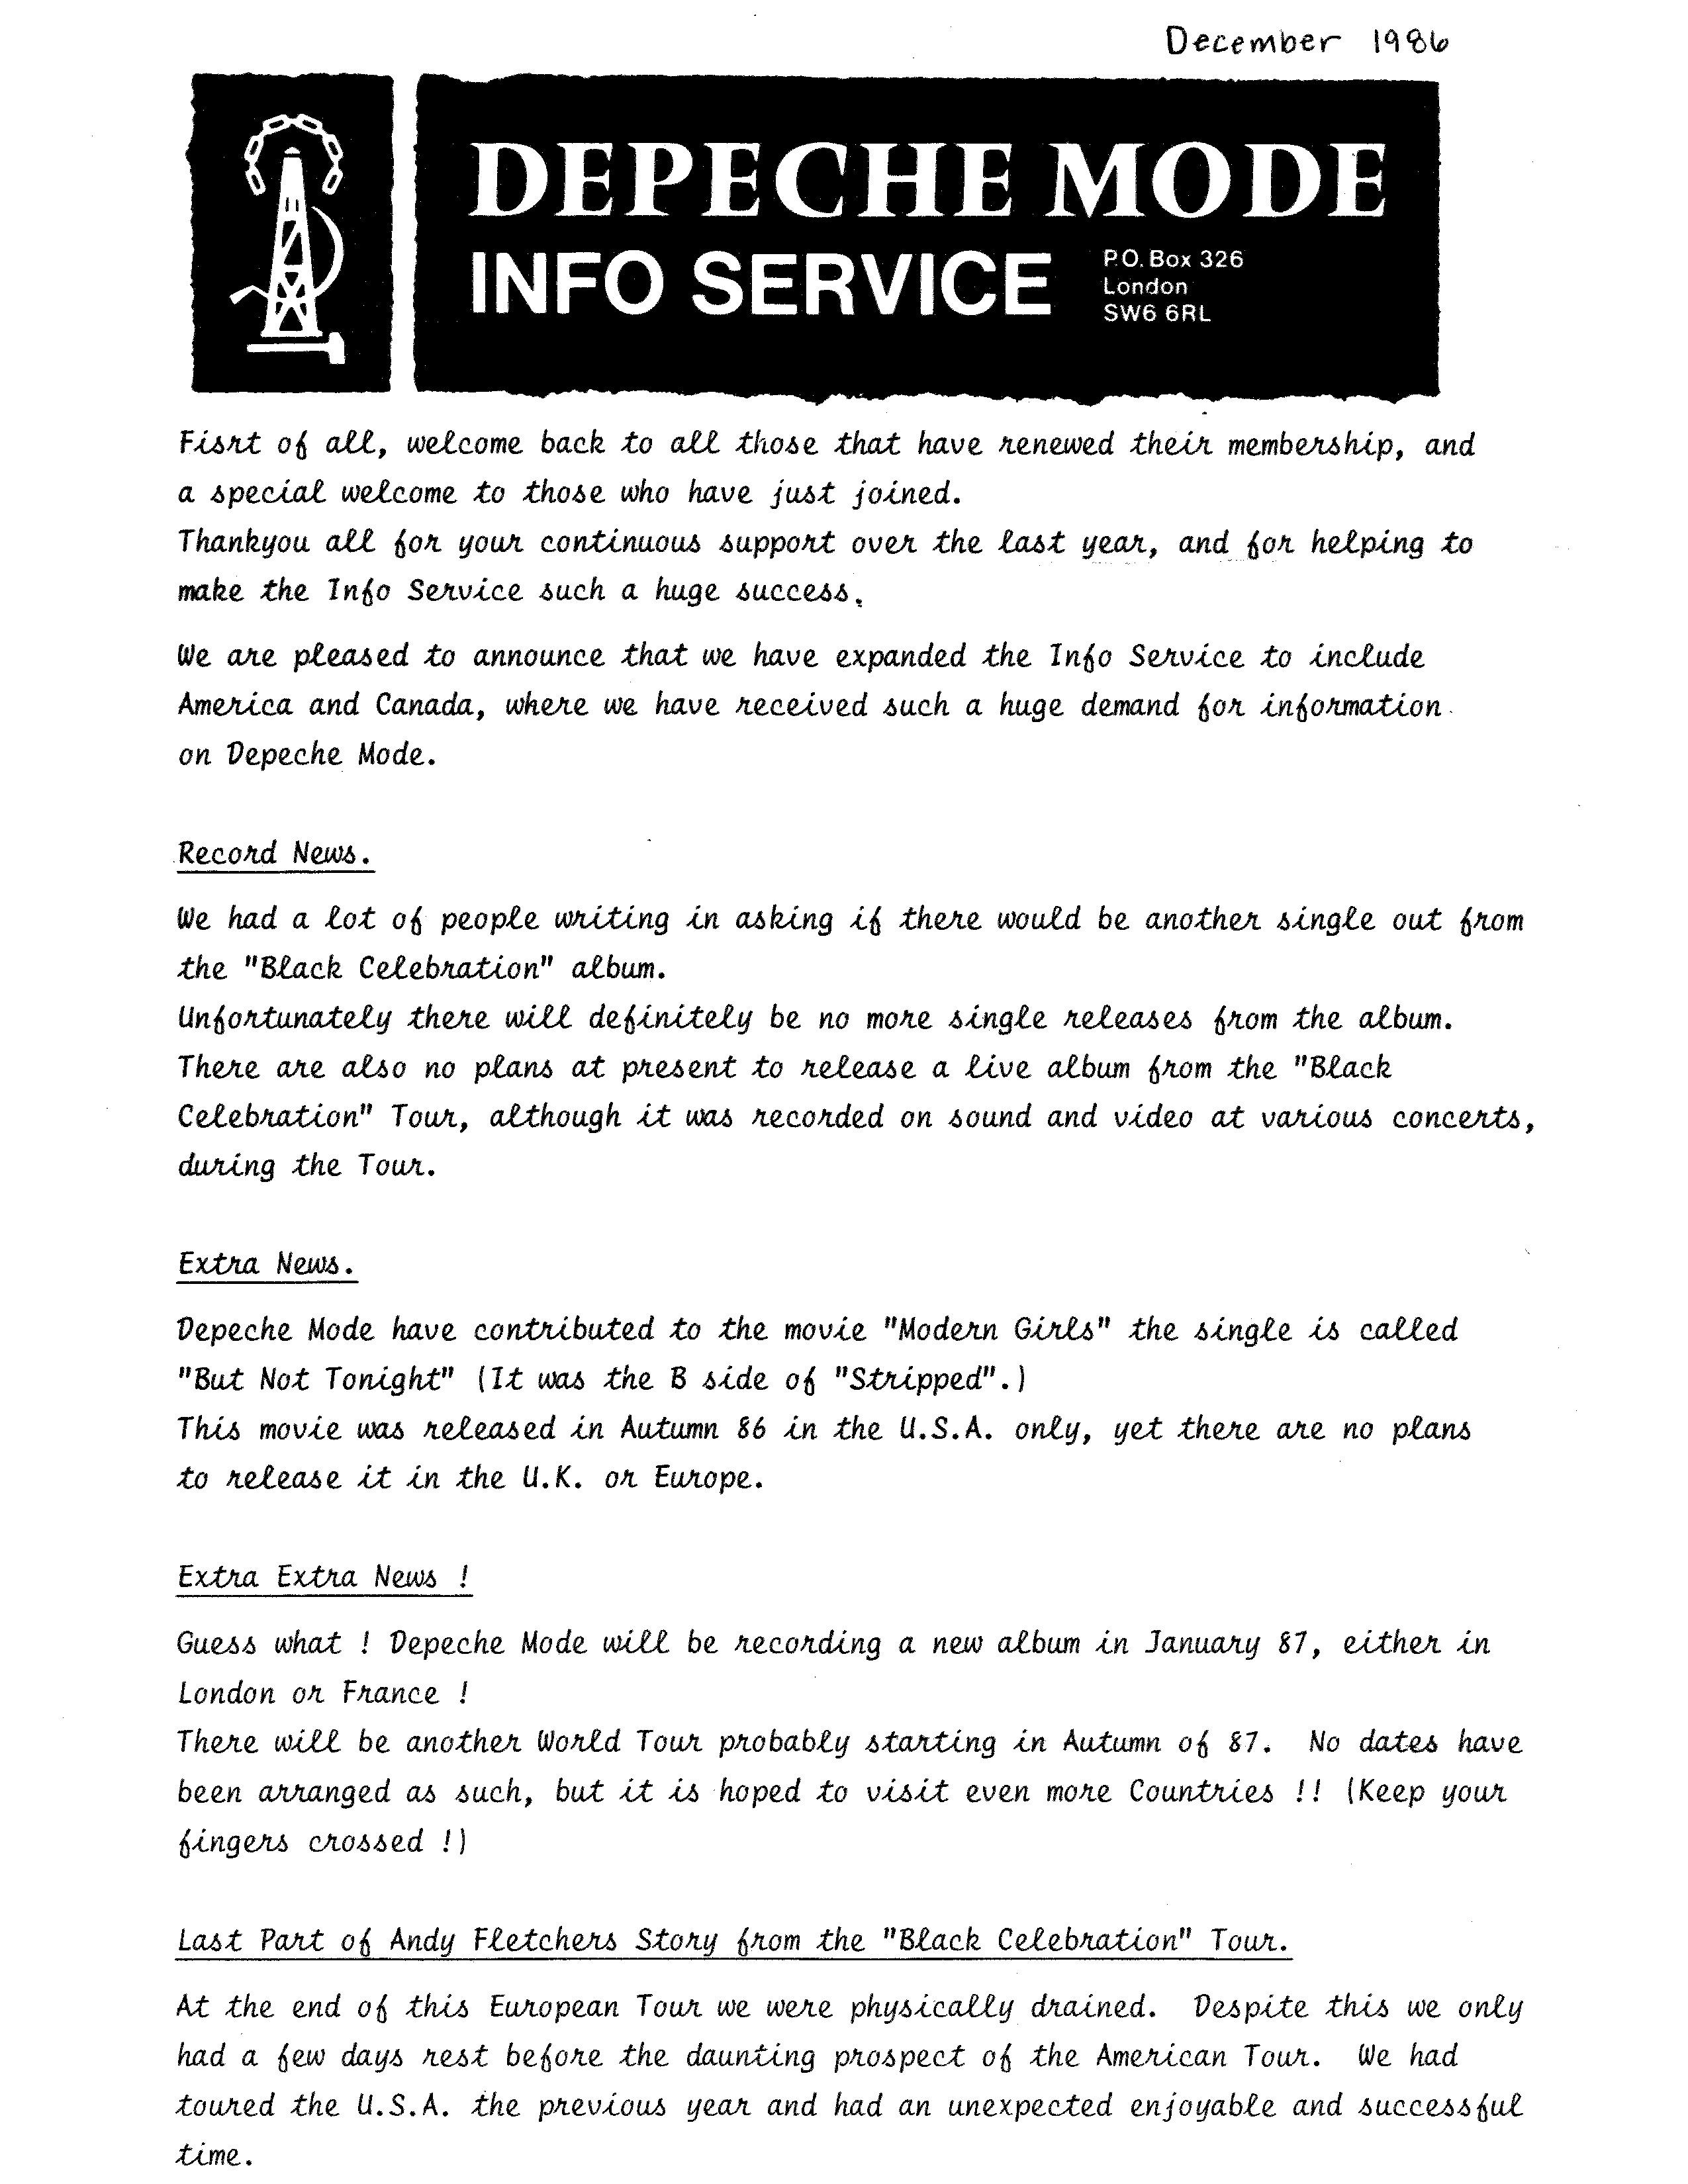 DM Info Service Newsletter Dec 1986 pg 1